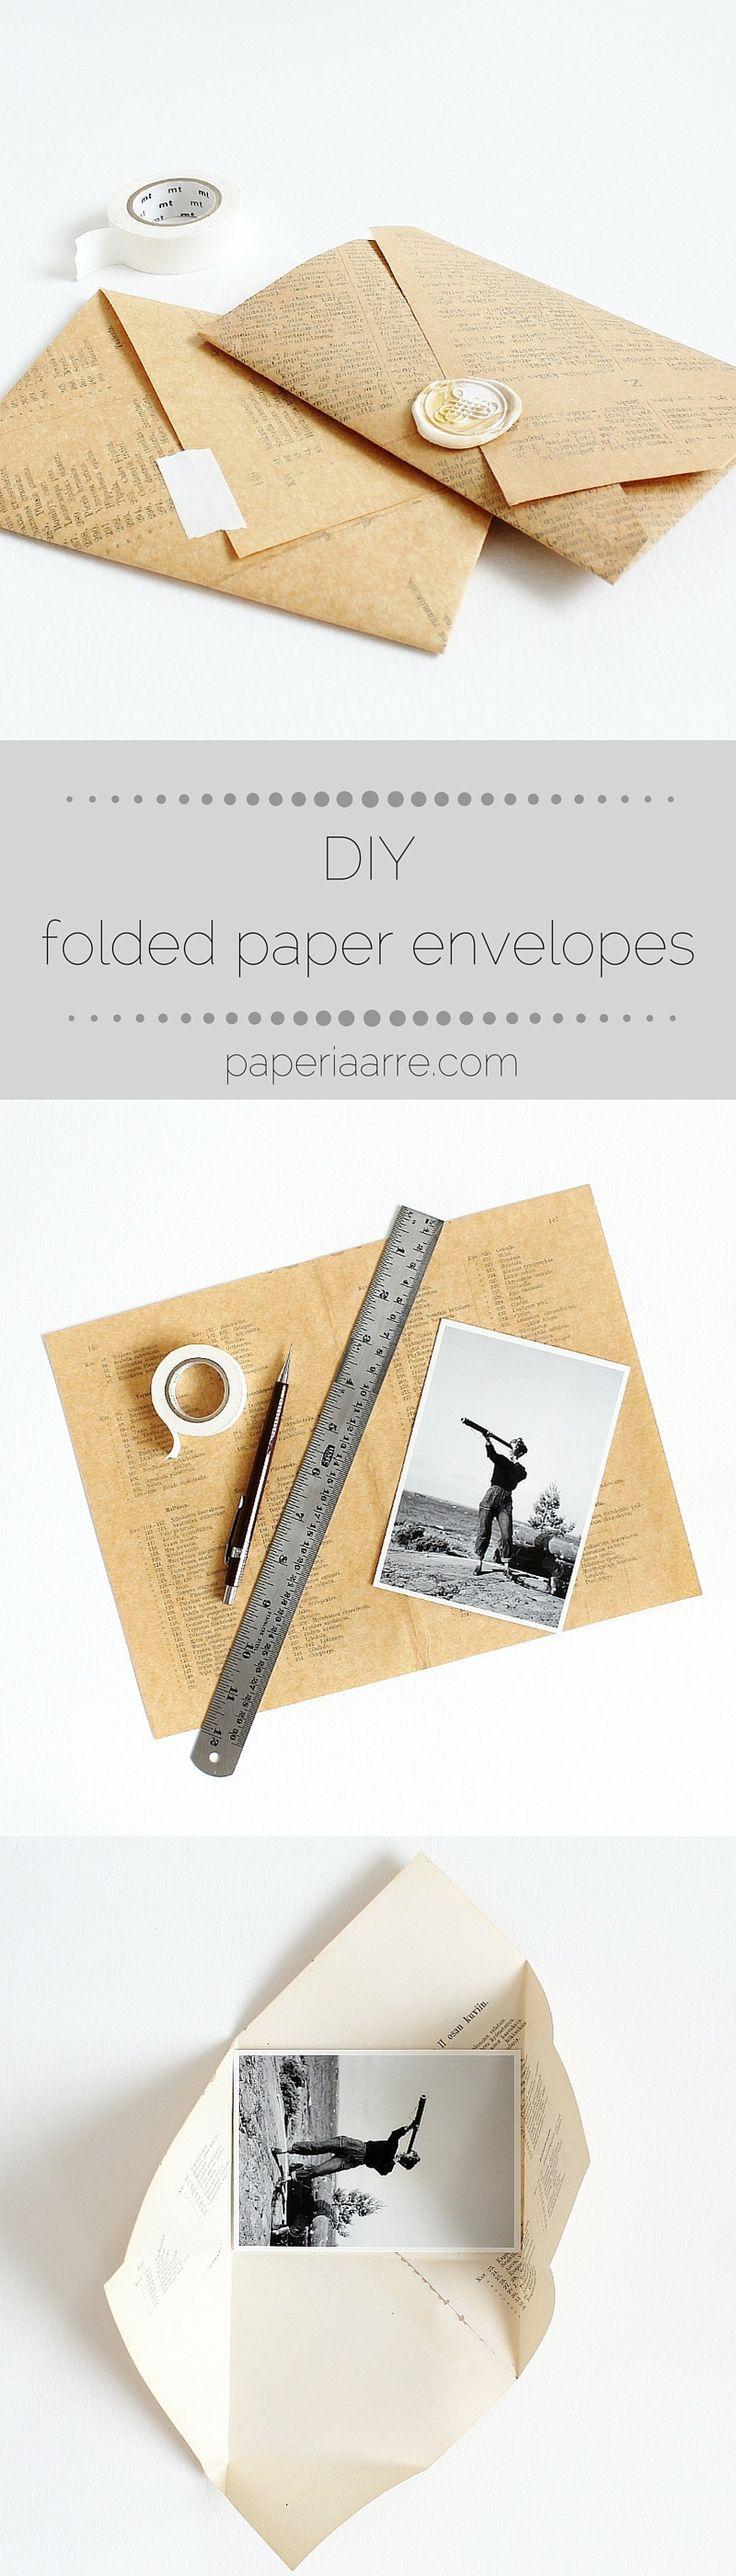 super simple folded envelopes - tutorial